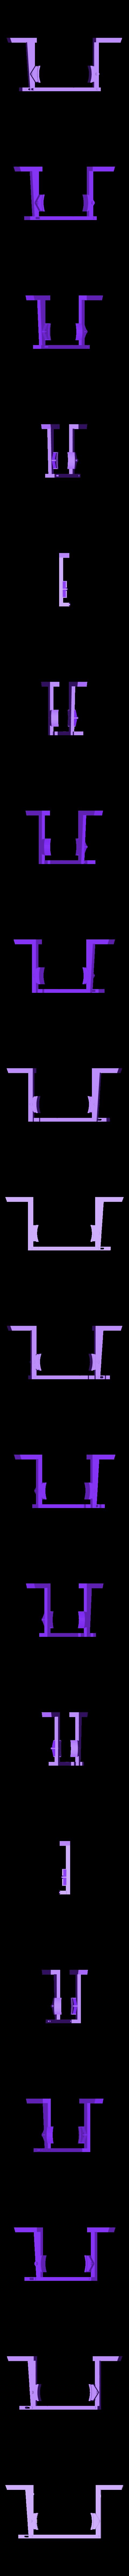 G freins boite essieu 2.STL Download STL file Draisine Matisa for LGB • 3D printable object, biddle